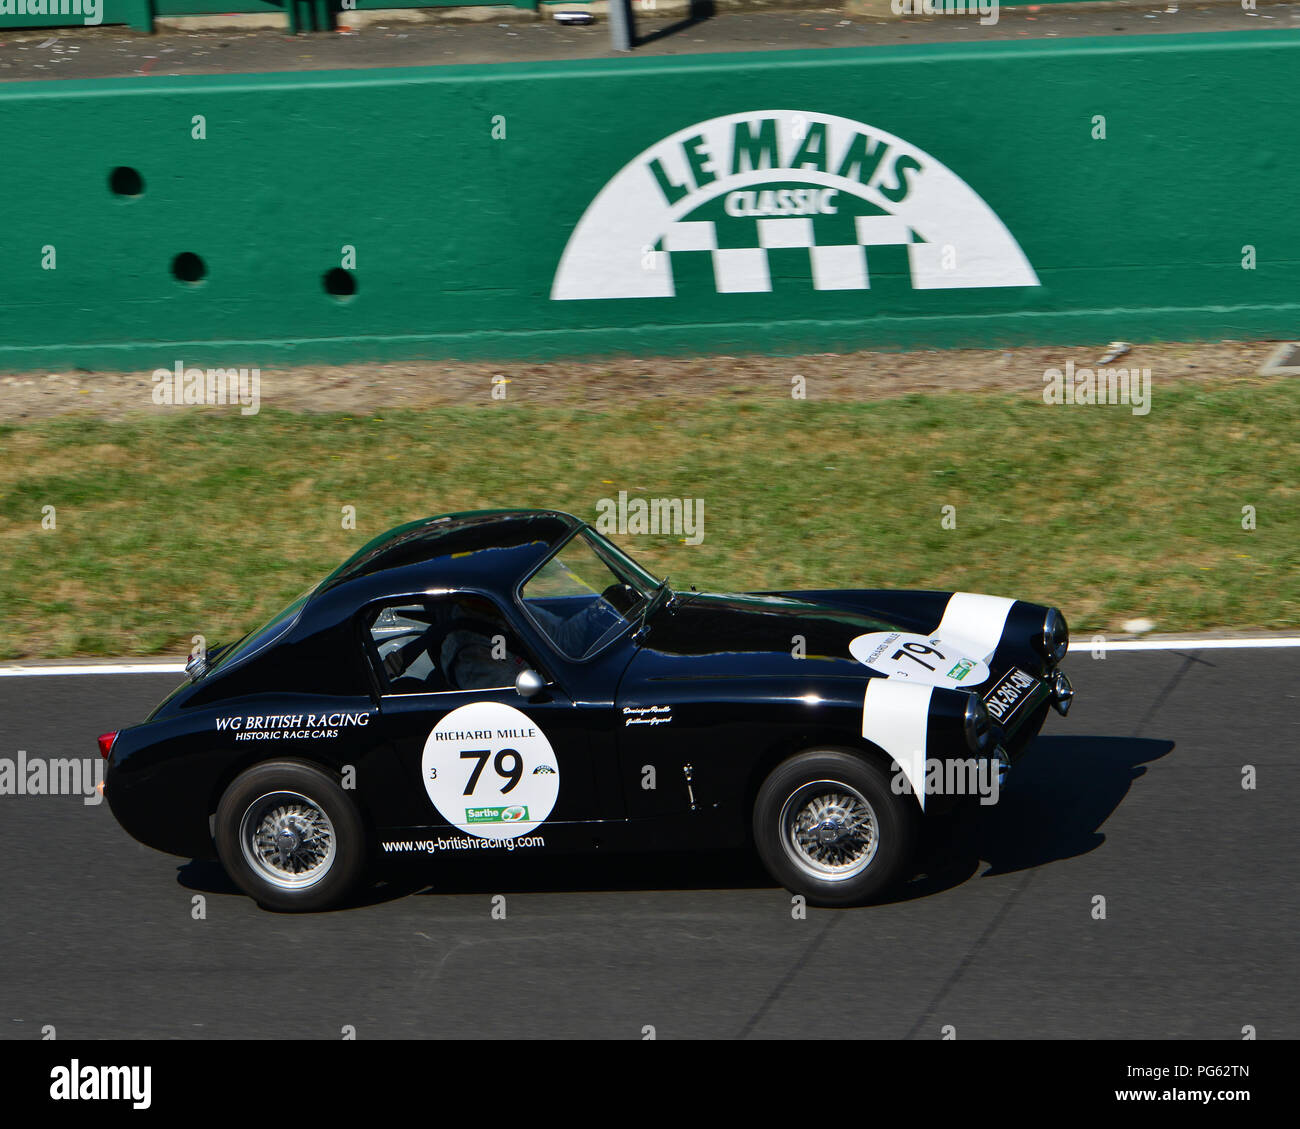 Dominique Rosello, Guillaume Gagnard, Austin Healey Sprite, Plateau 3, Grid 3, Le Mans Classic 2018, July 2018, Le Mans, France, circuit racing, Class - Stock Image